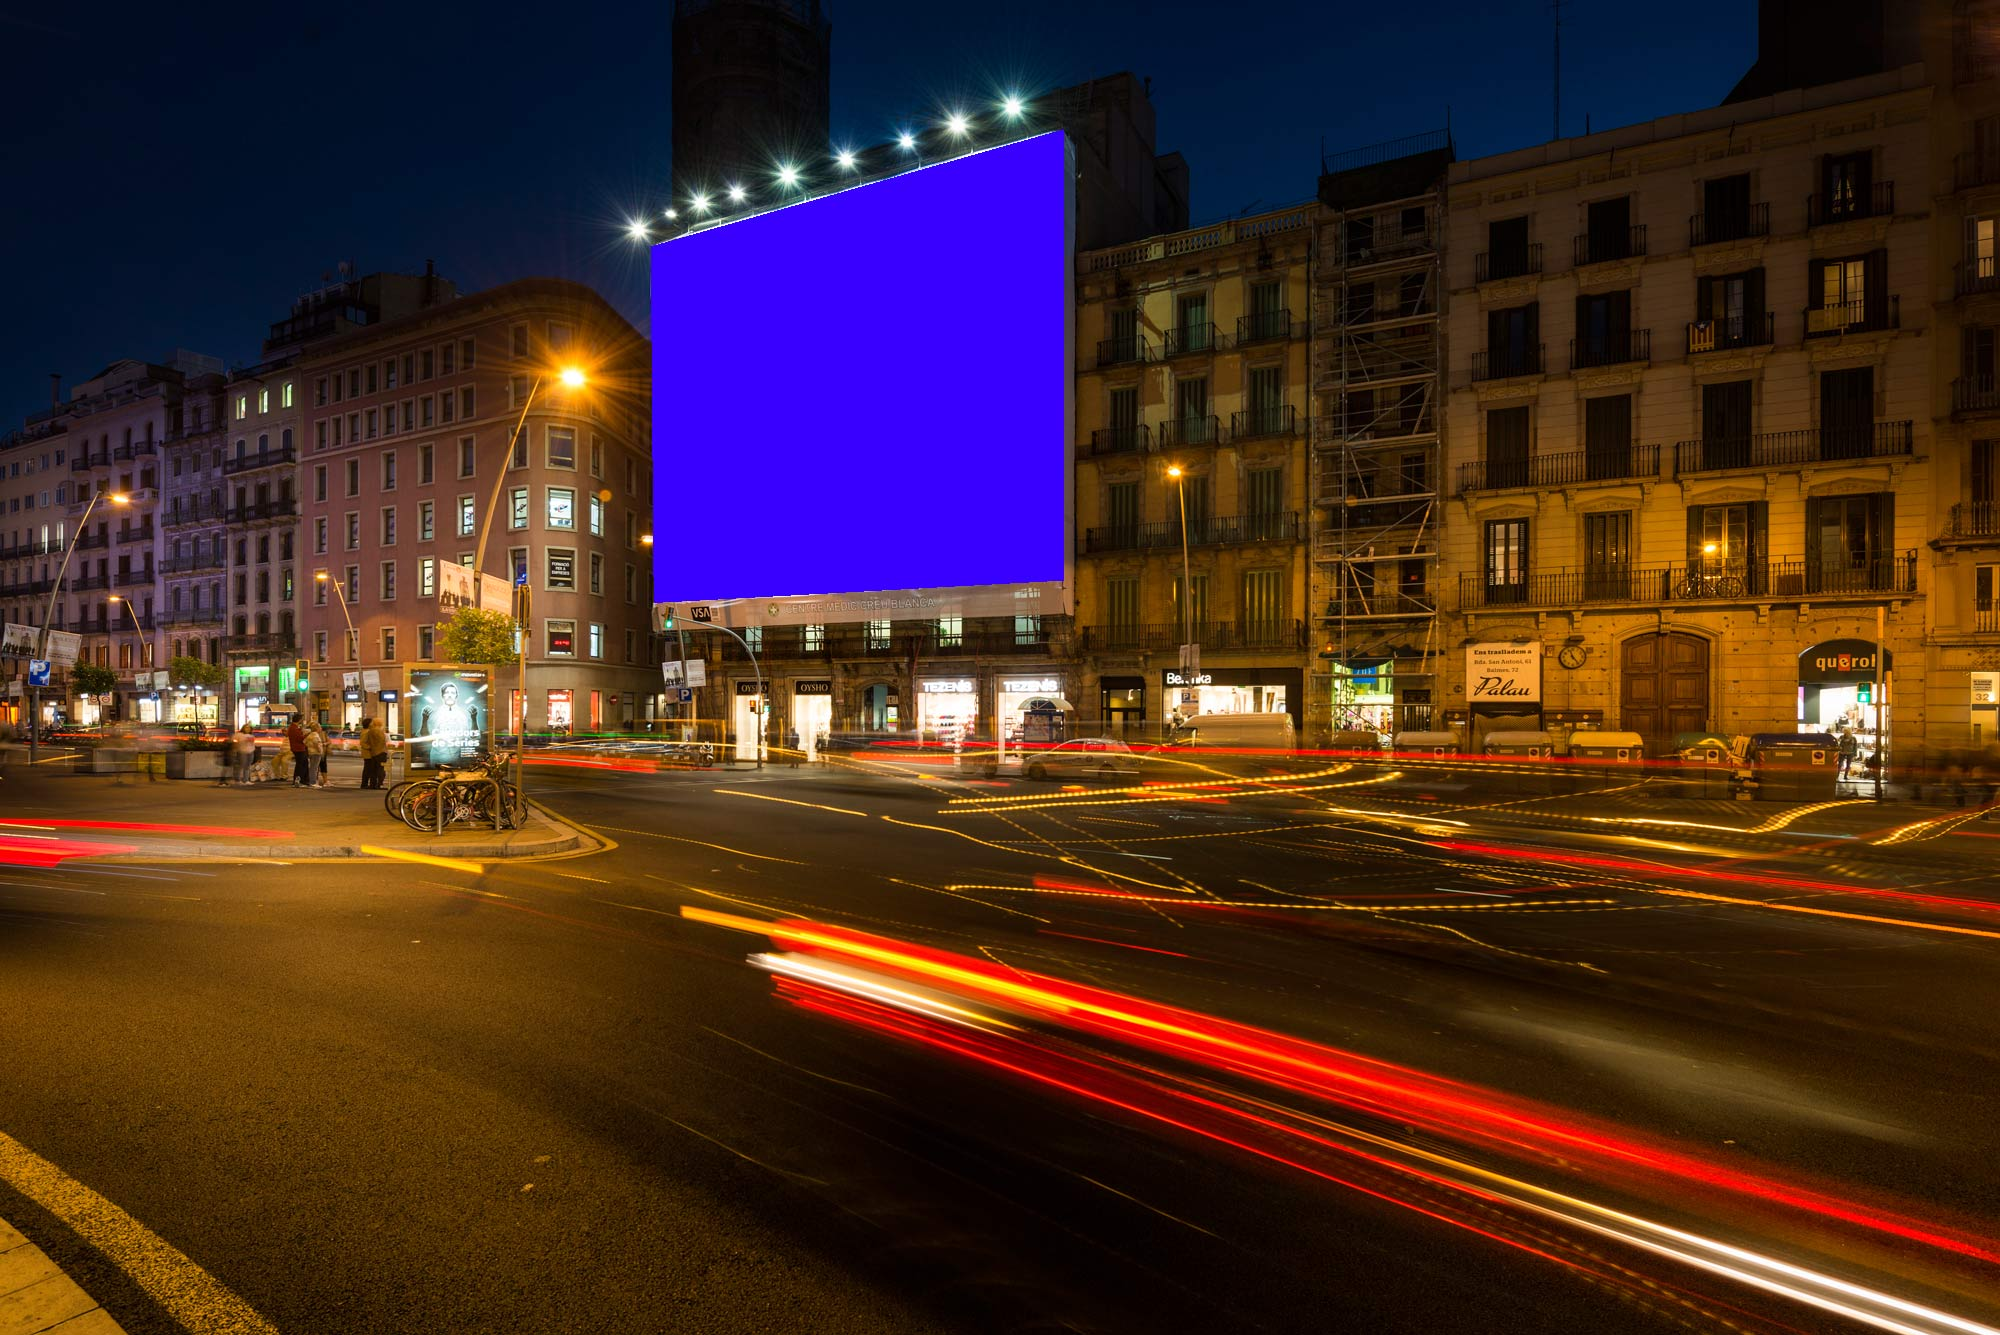 lona-publicitaria-barcelona-pelayo-lateral-faldon-azul-vsa-comunicacion